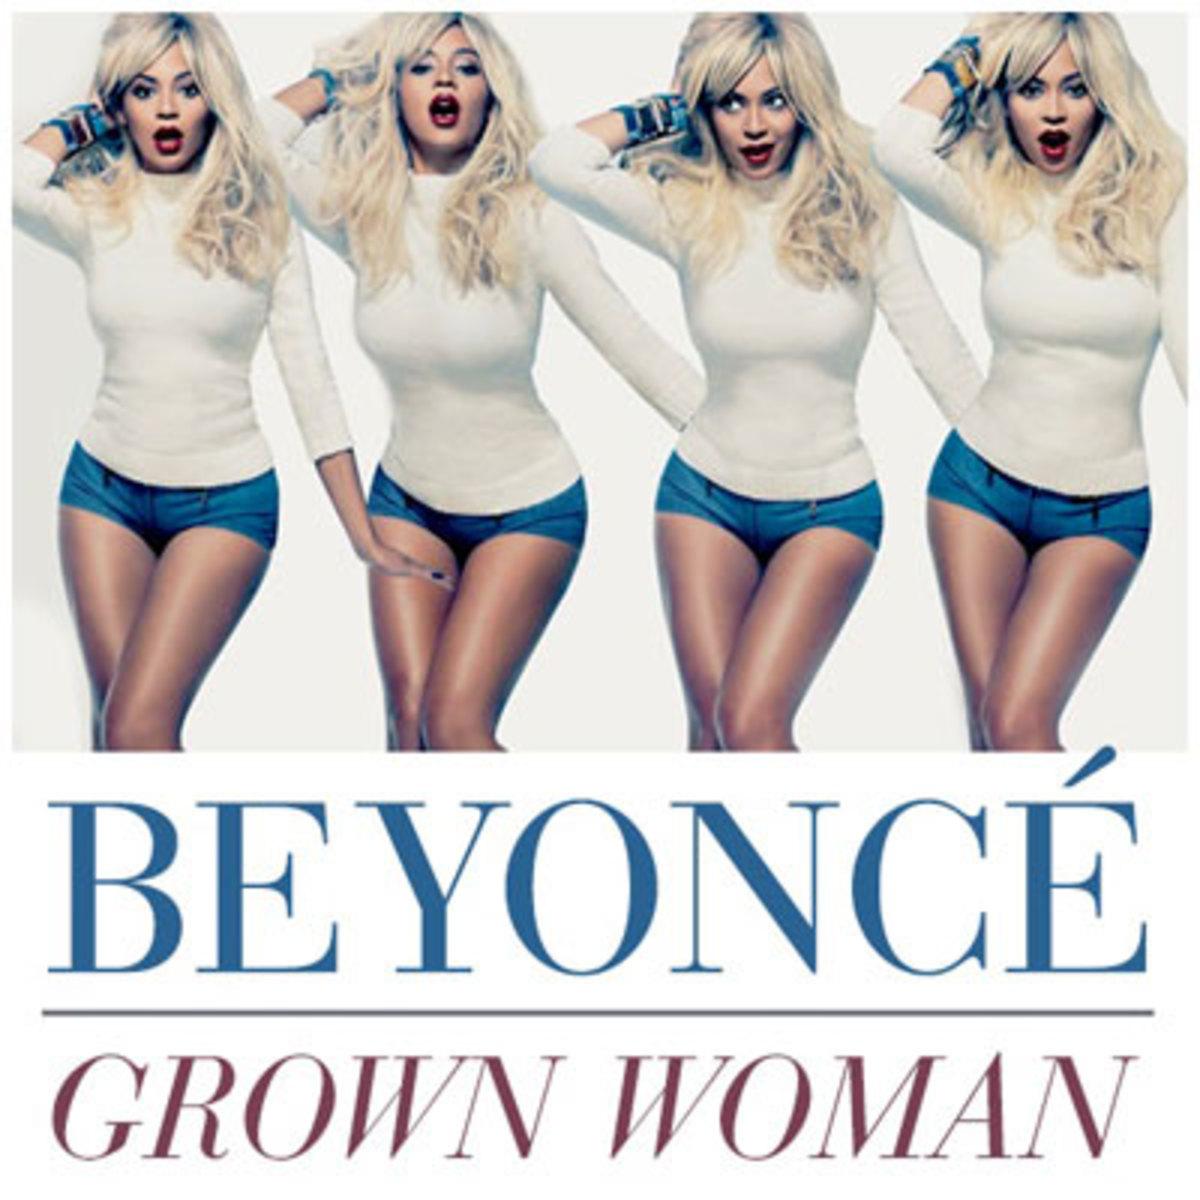 beyonce-grownwoman.jpg